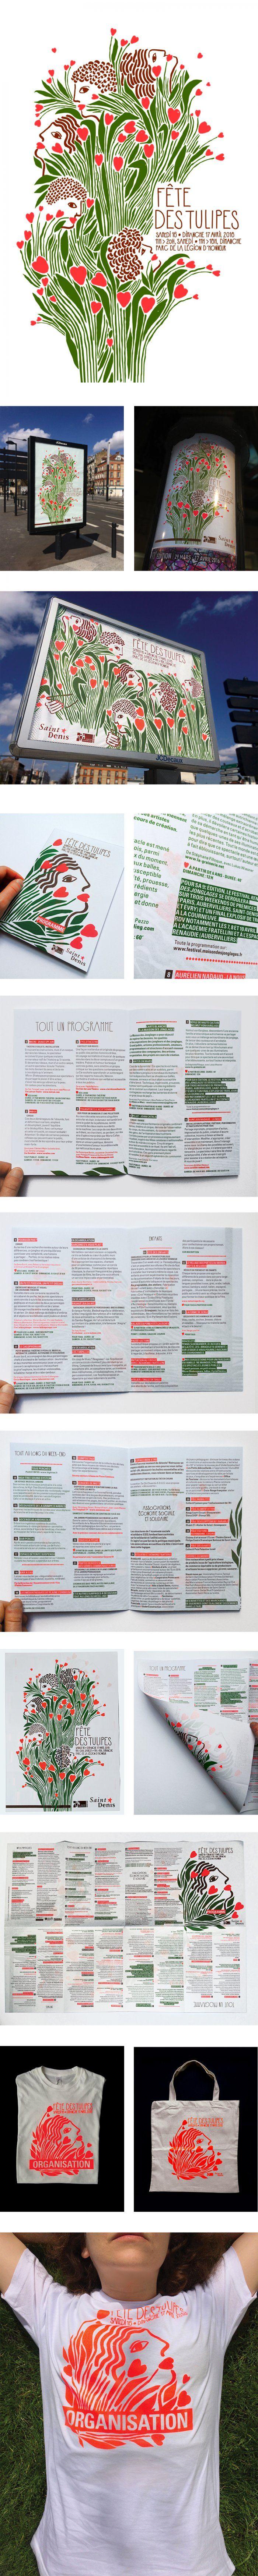 |||||||||||||||===== Le PasQueBeau =====||||||||||||||| #illustration #draw #poster #graphic #design #designgraphic #graphic #handmade #affiche #design #graphique #nature